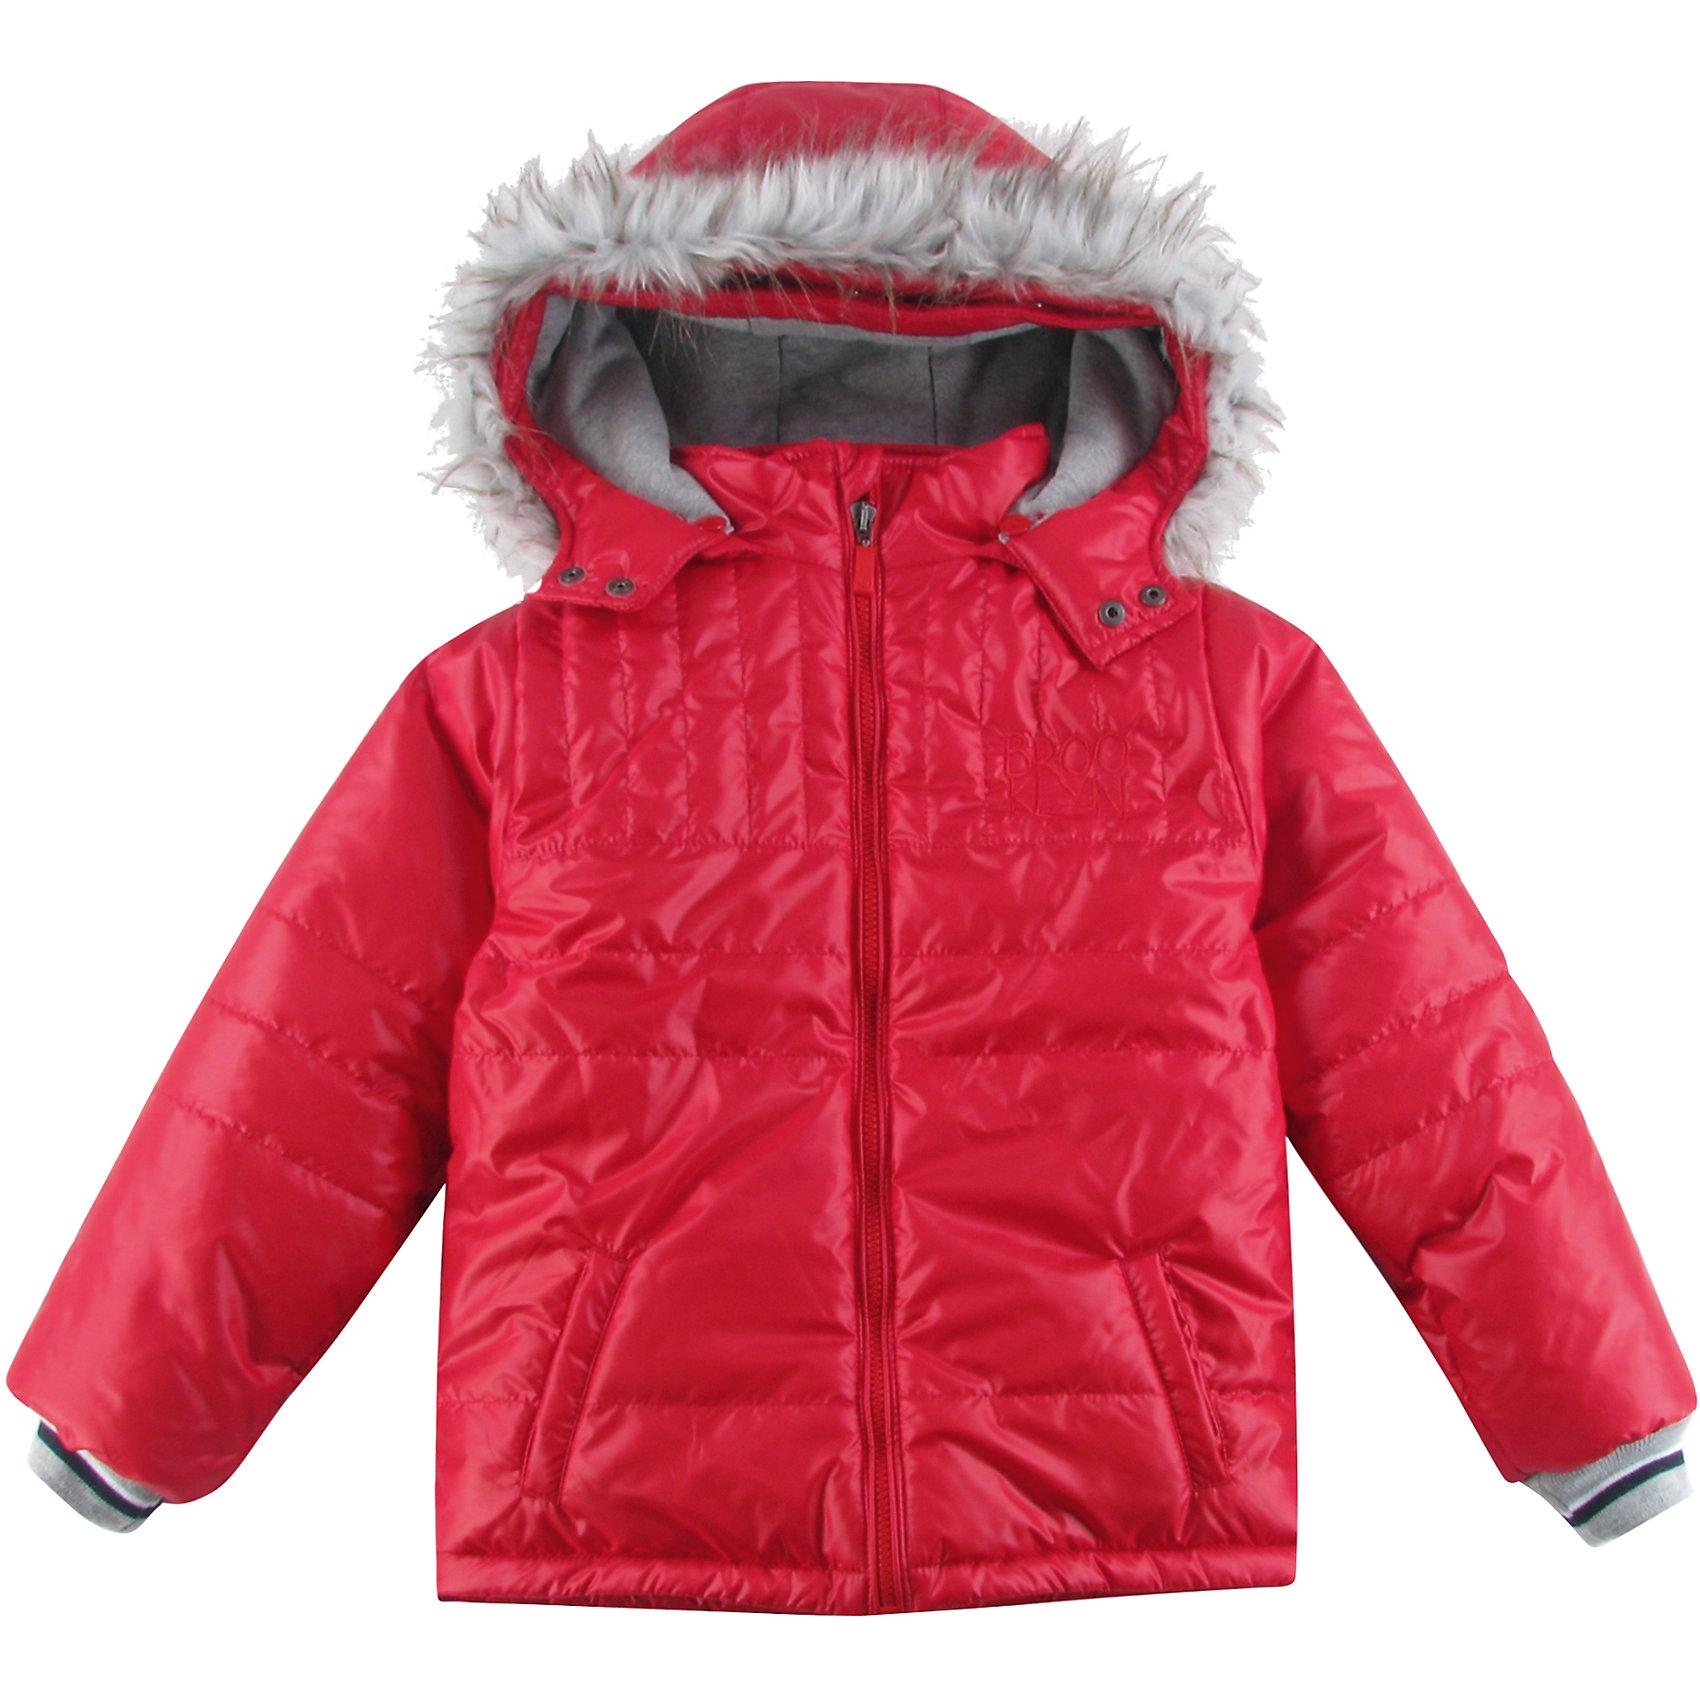 Куртка утепленная для мальчика WojcikВерхняя одежда<br>Куртка утепленная для мальчика Wojcik<br>Состав:<br>Полиэстер 100%<br><br>Ширина мм: 356<br>Глубина мм: 10<br>Высота мм: 245<br>Вес г: 519<br>Цвет: бордовый<br>Возраст от месяцев: 144<br>Возраст до месяцев: 156<br>Пол: Мужской<br>Возраст: Детский<br>Размер: 158,128,134,140,146,152<br>SKU: 5592287